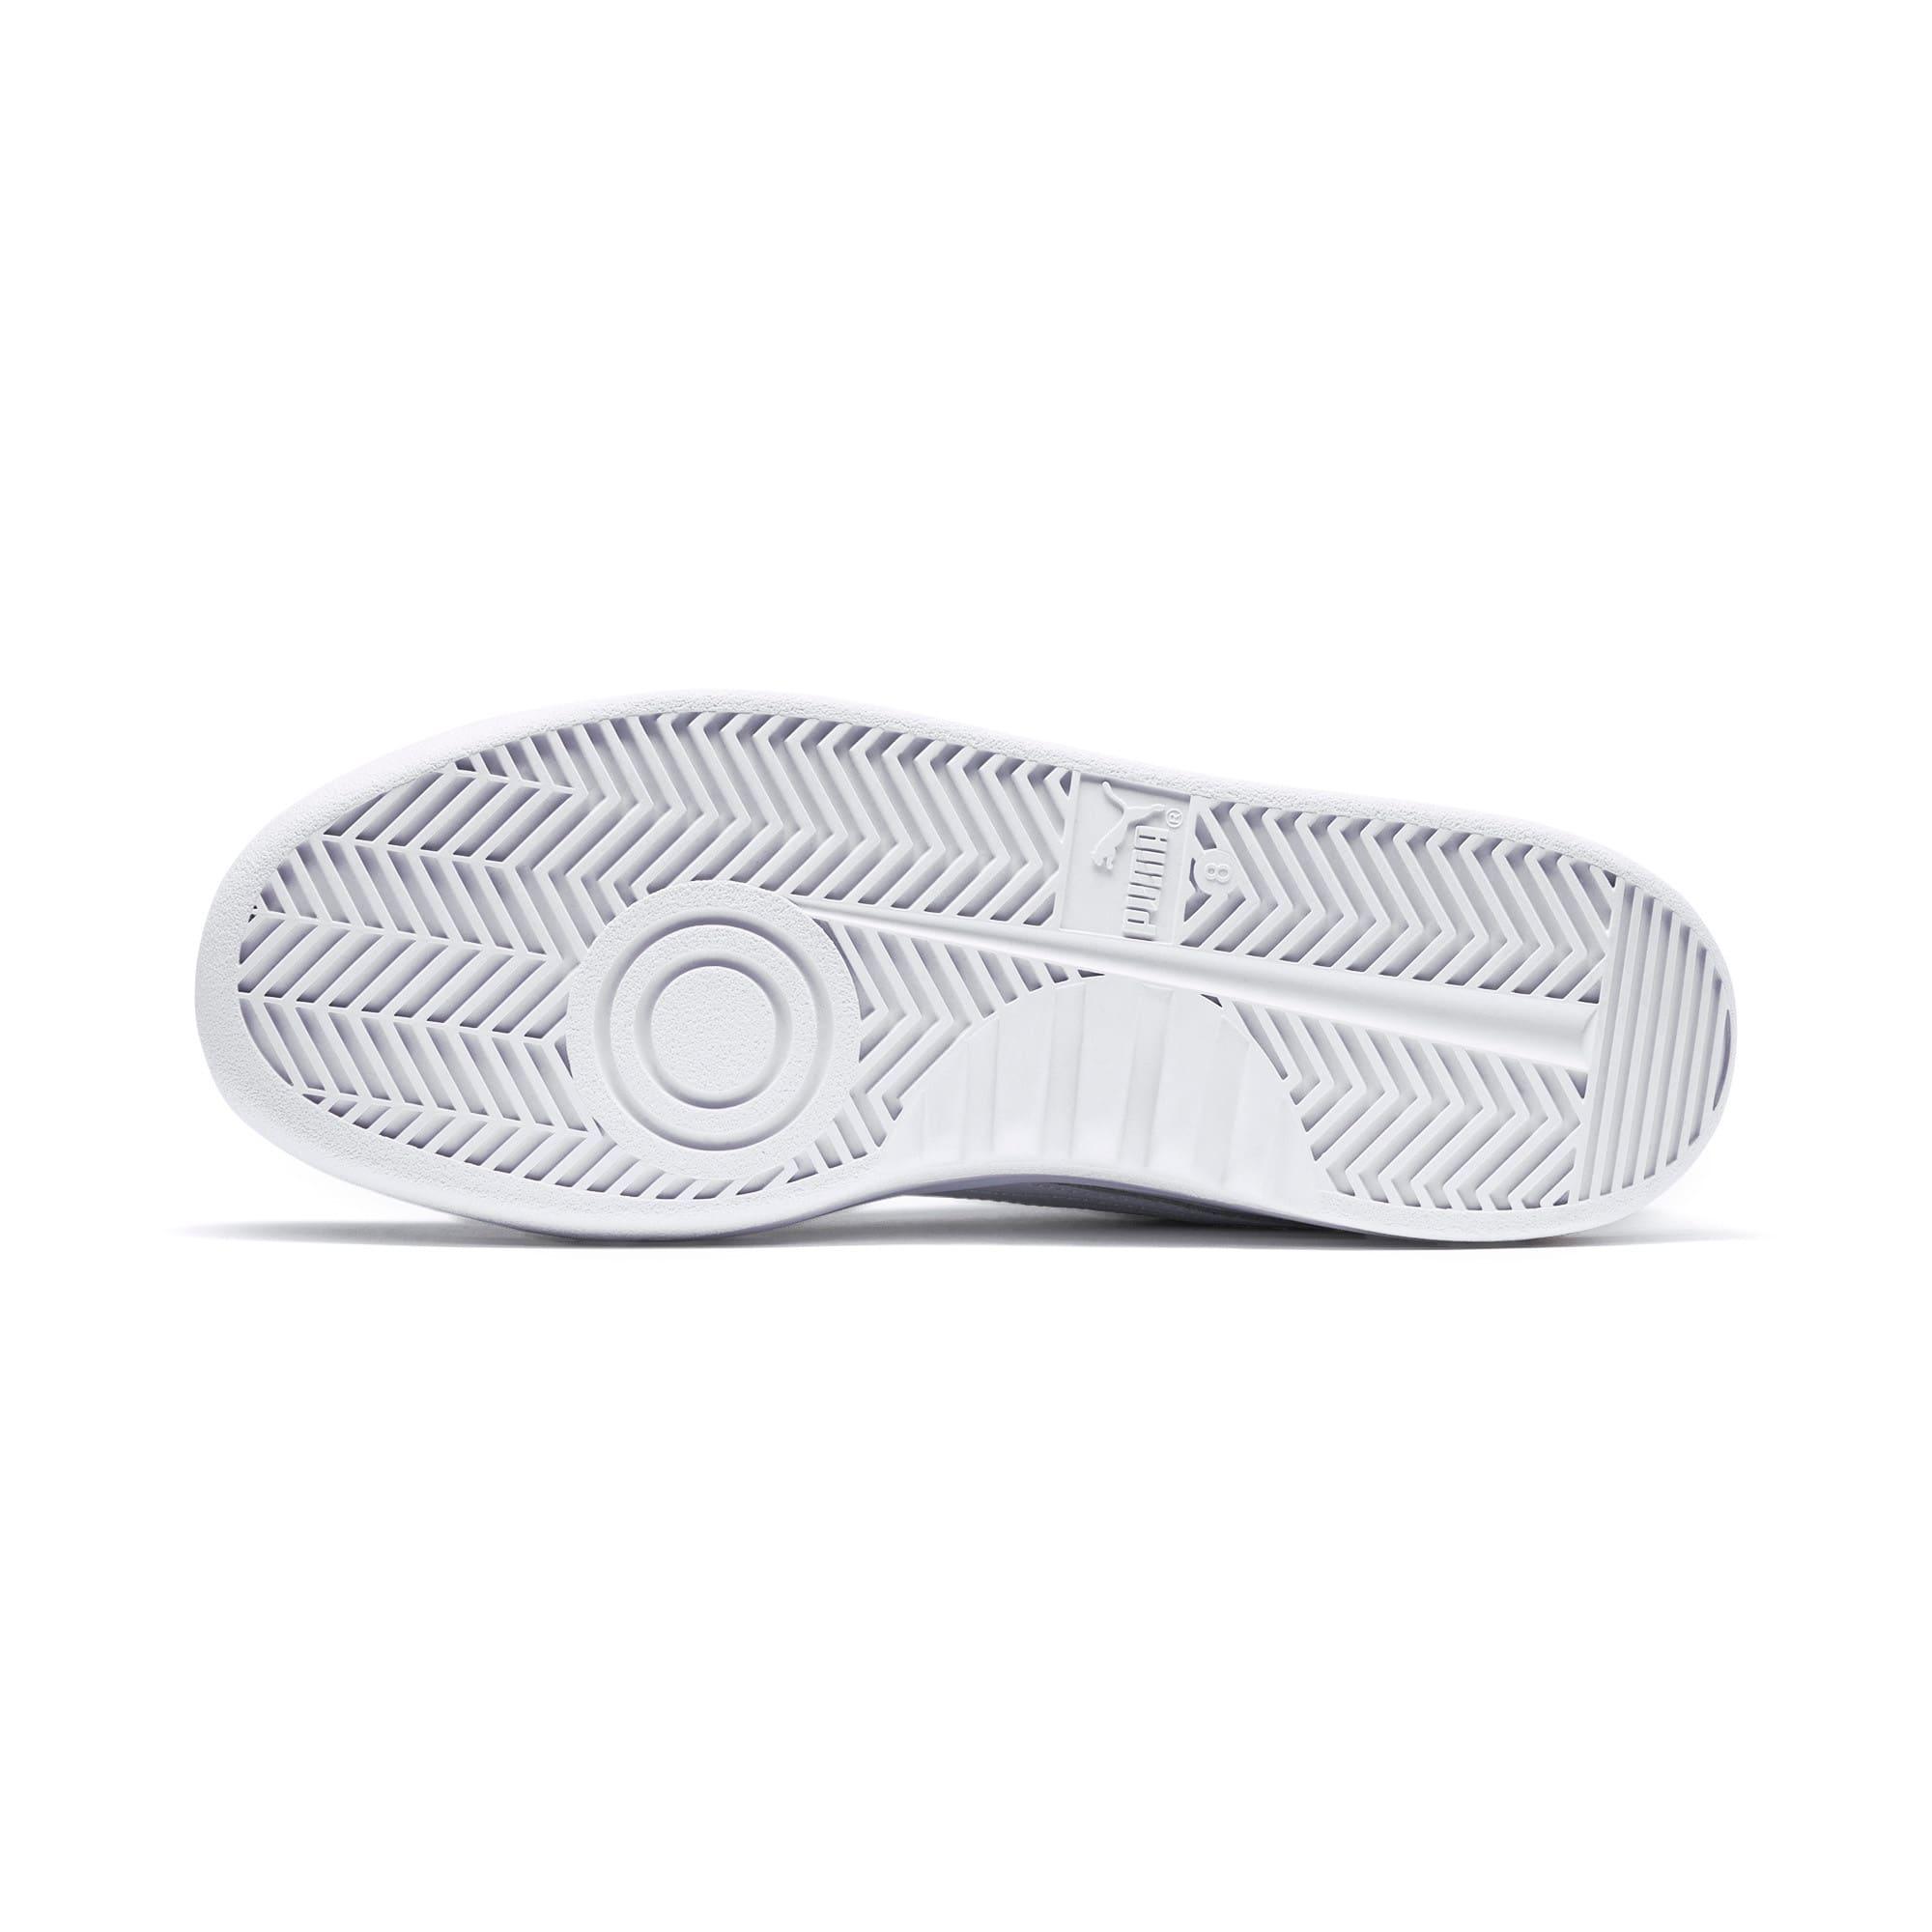 Thumbnail 5 of California Drive Thru Shoes, P Wht-HighRiskRed-Blazg Yelw, medium